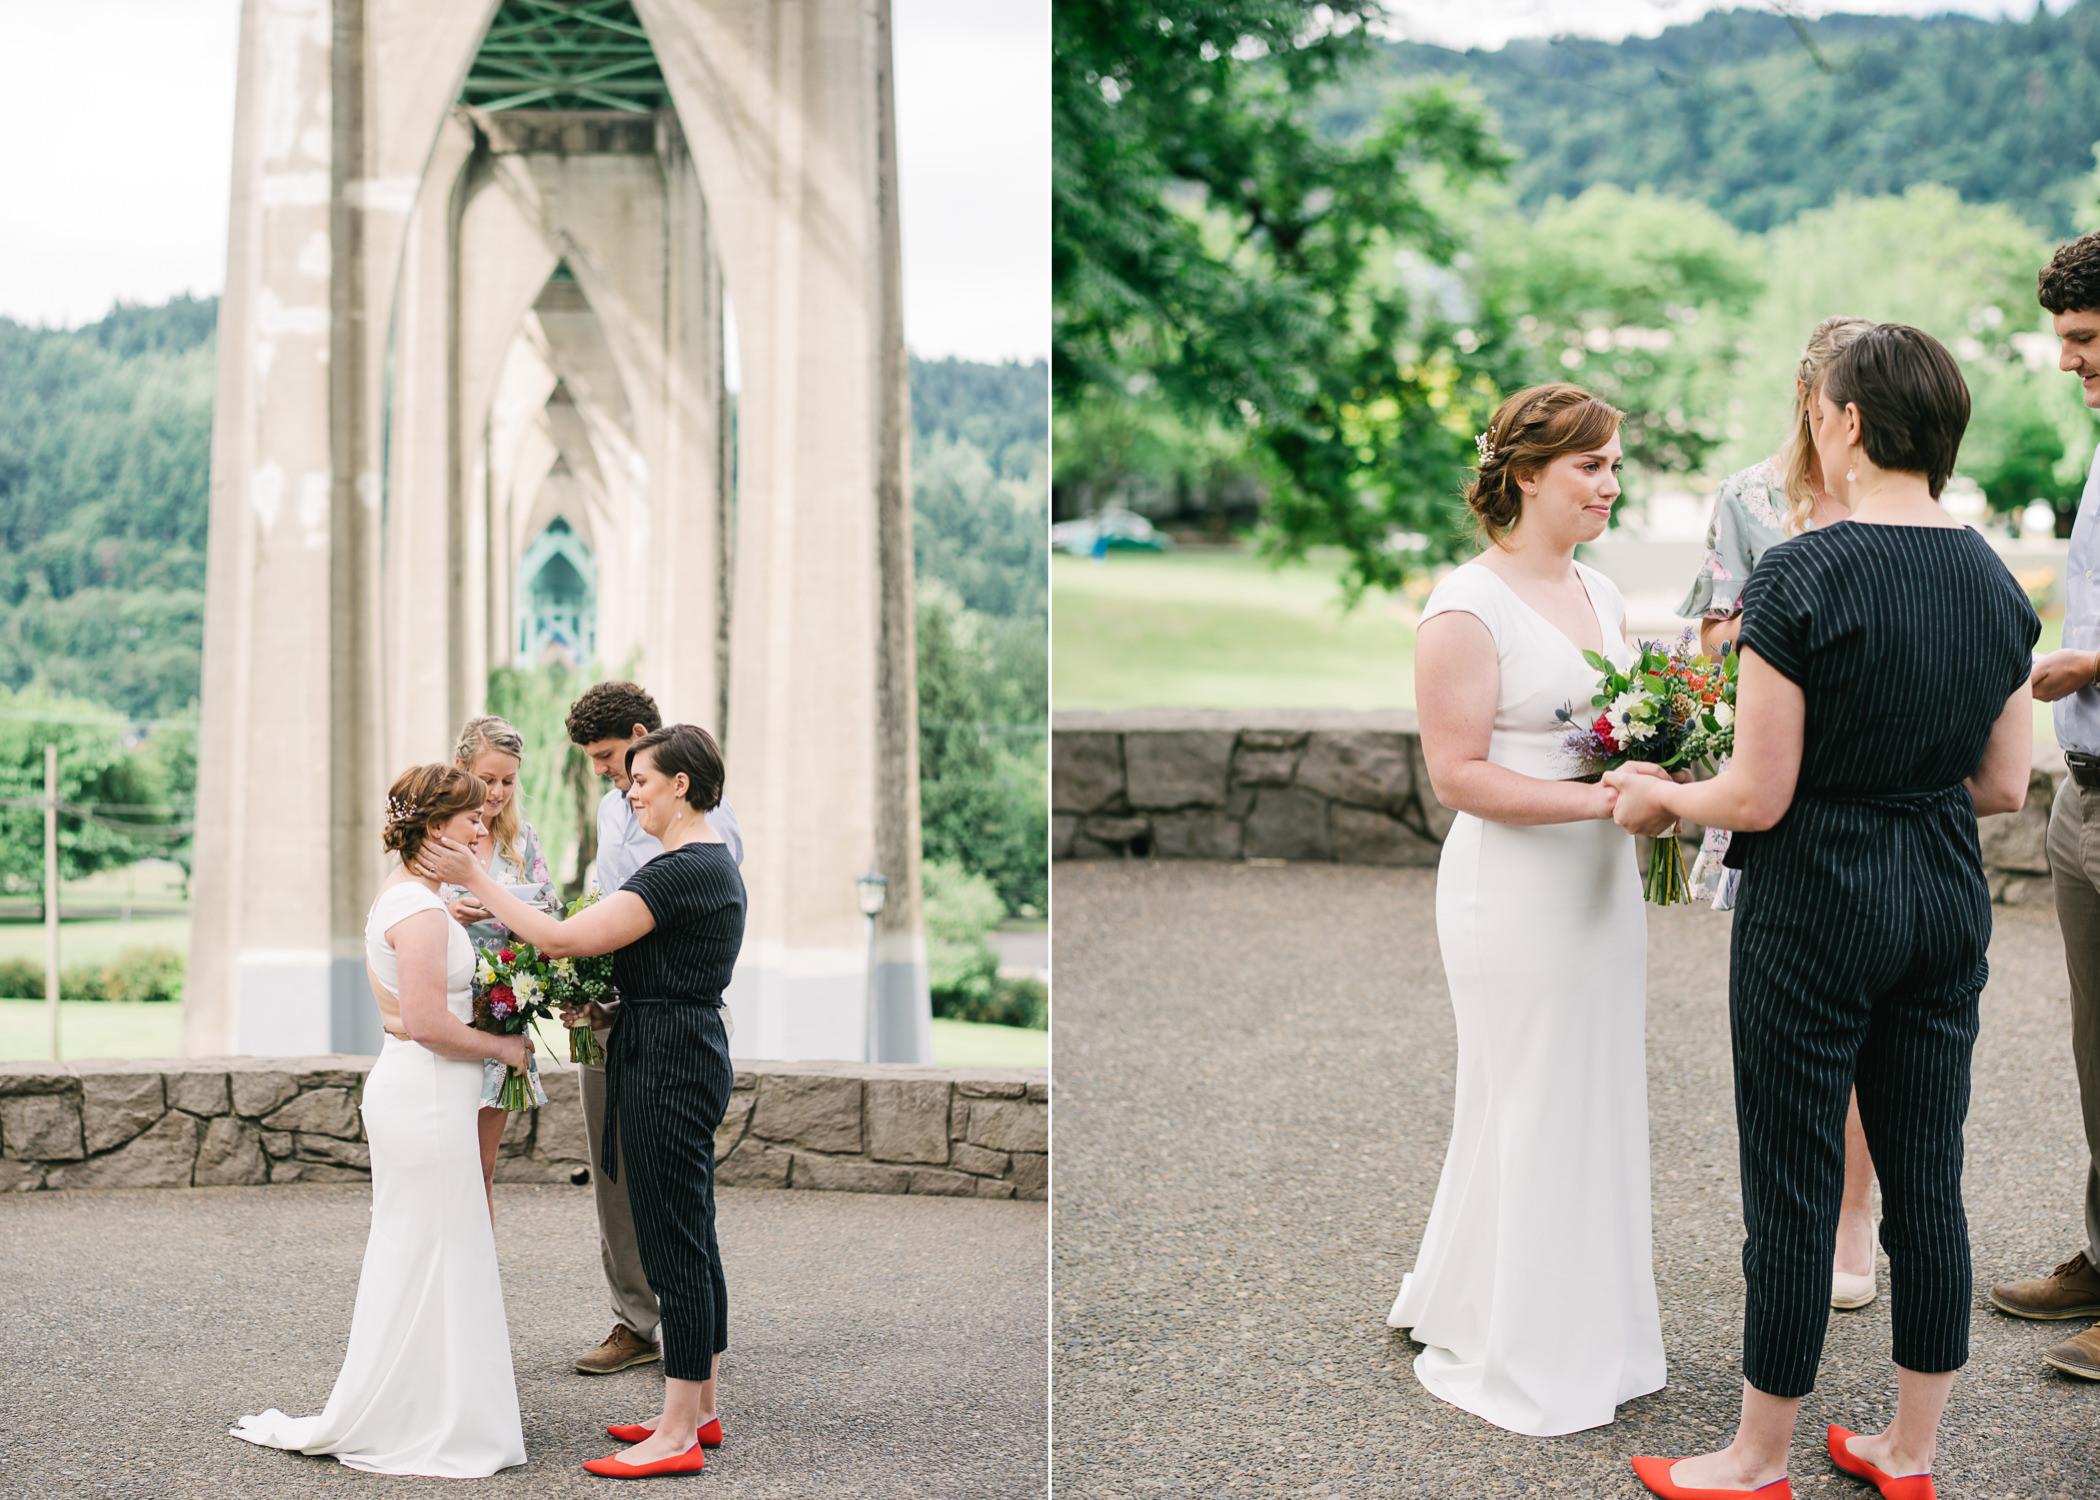 cathedral-park-portland-elopement-gay-wedding-017.JPG